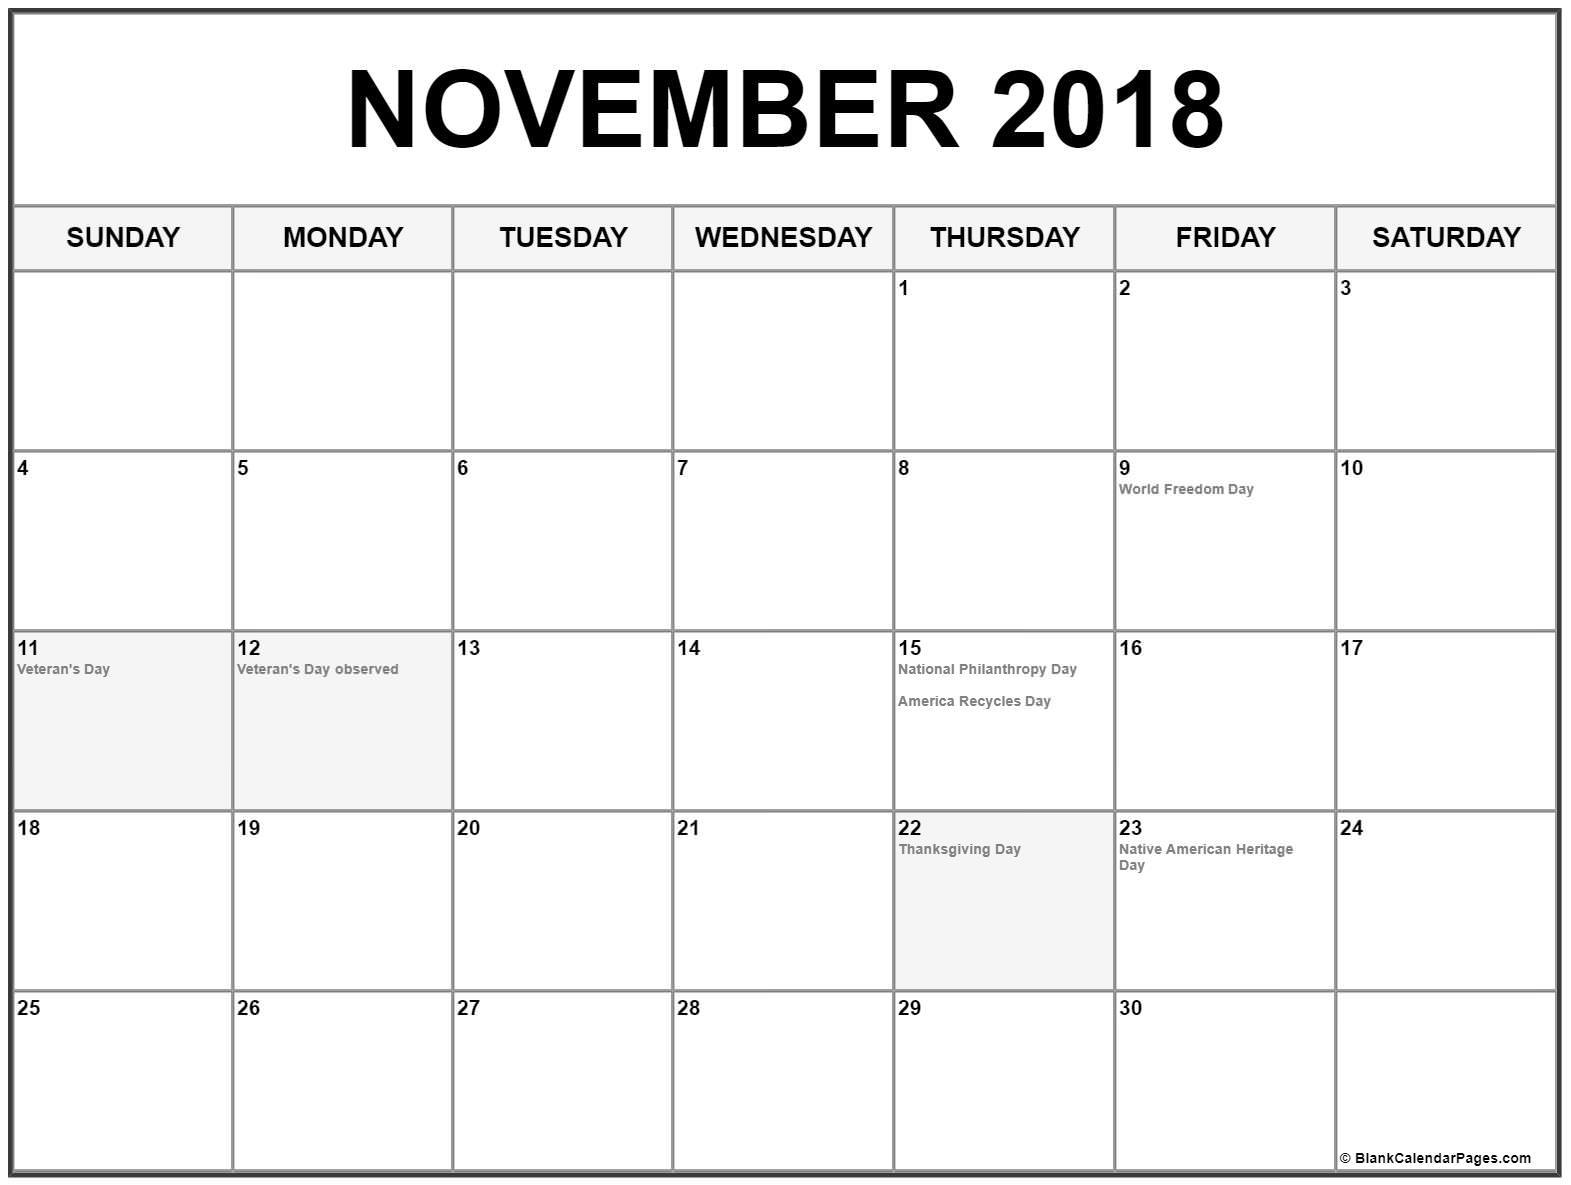 november 2018 calendar with holidays printable calendarnovember 2018 calendar usa